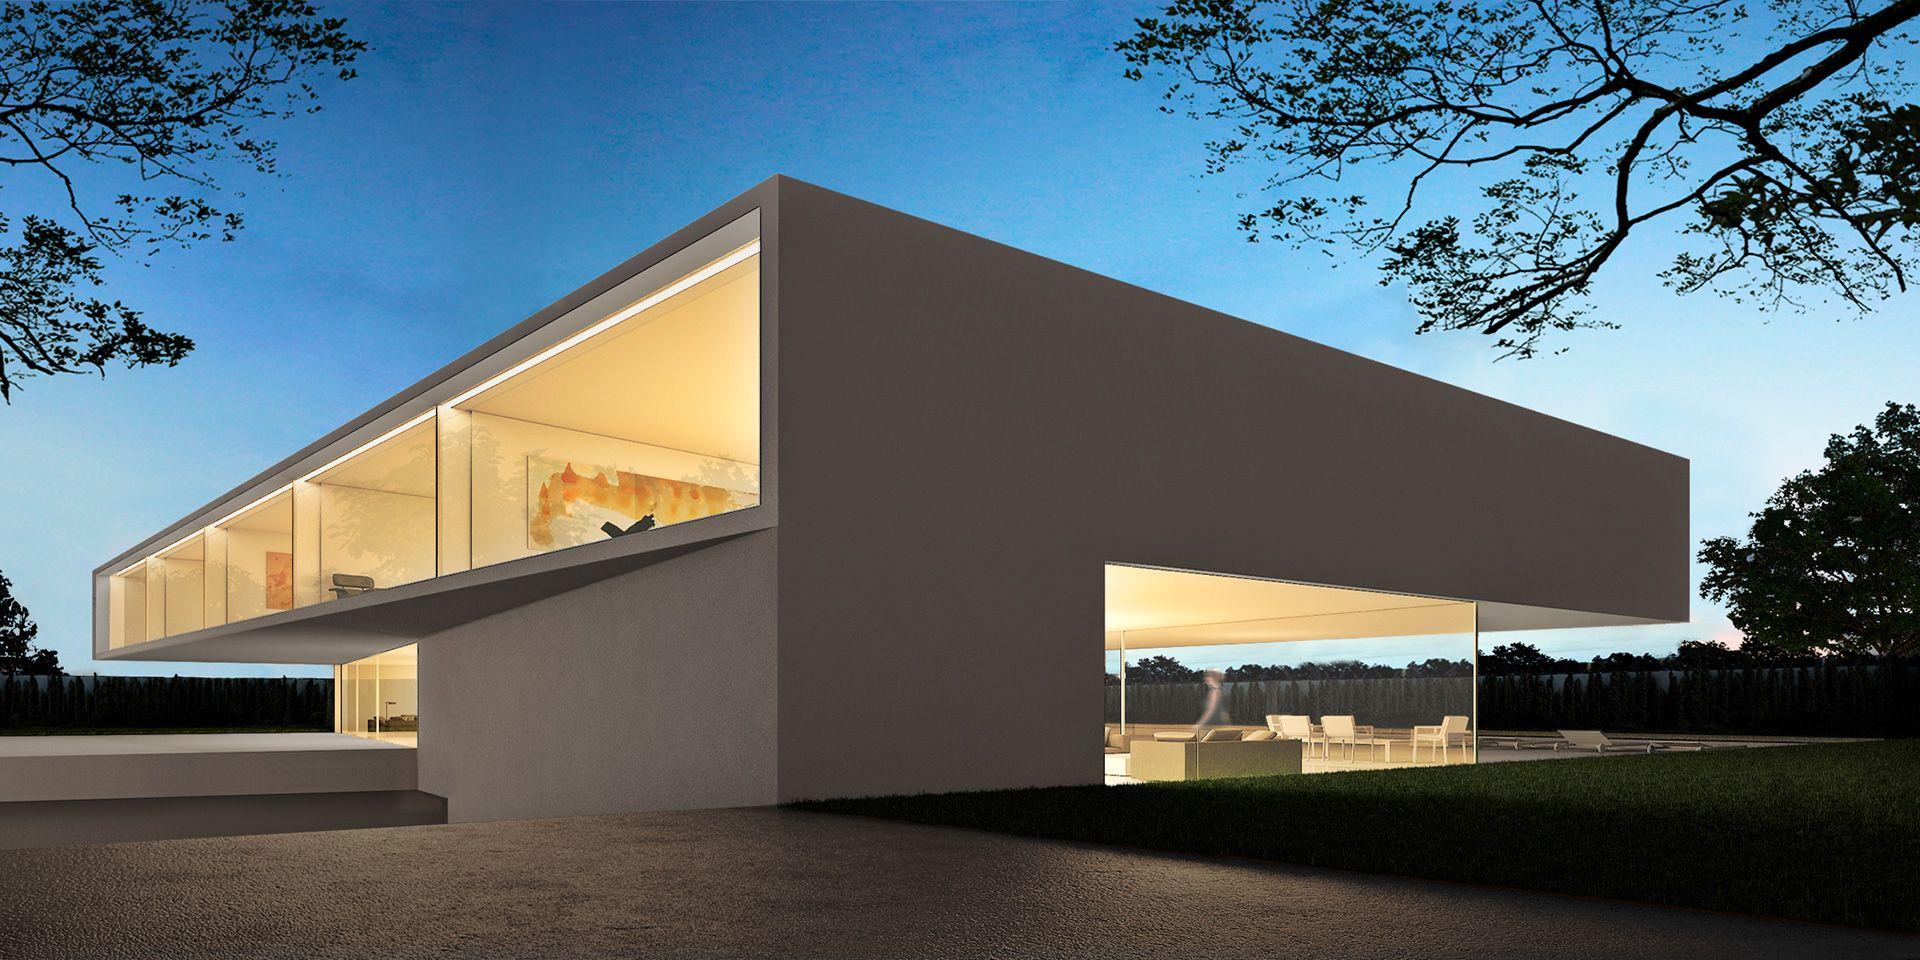 Mdj fran silvestre arquitectos valencia 002 modern - Fran silvestre arquitectos ...